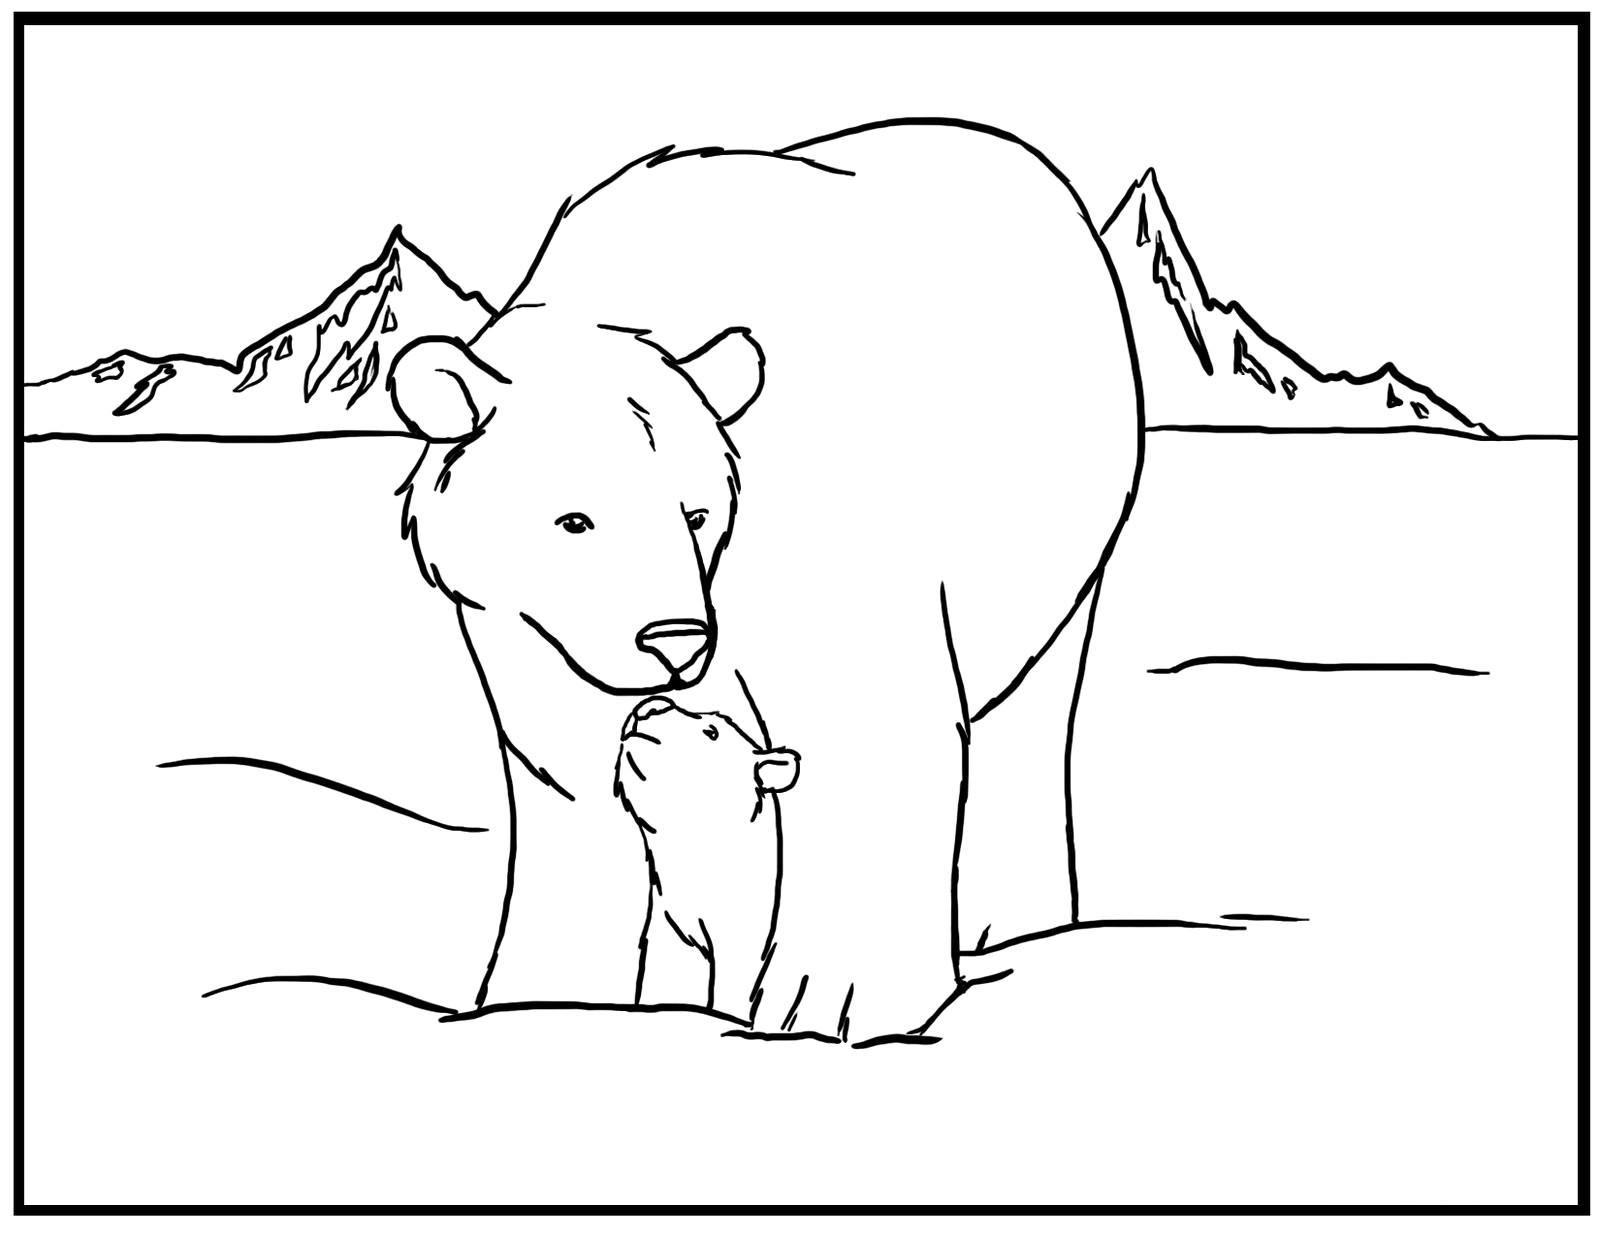 Polar Bear Coloring Pages Free | Diywordpress - Polar Bear Printable Pictures Free